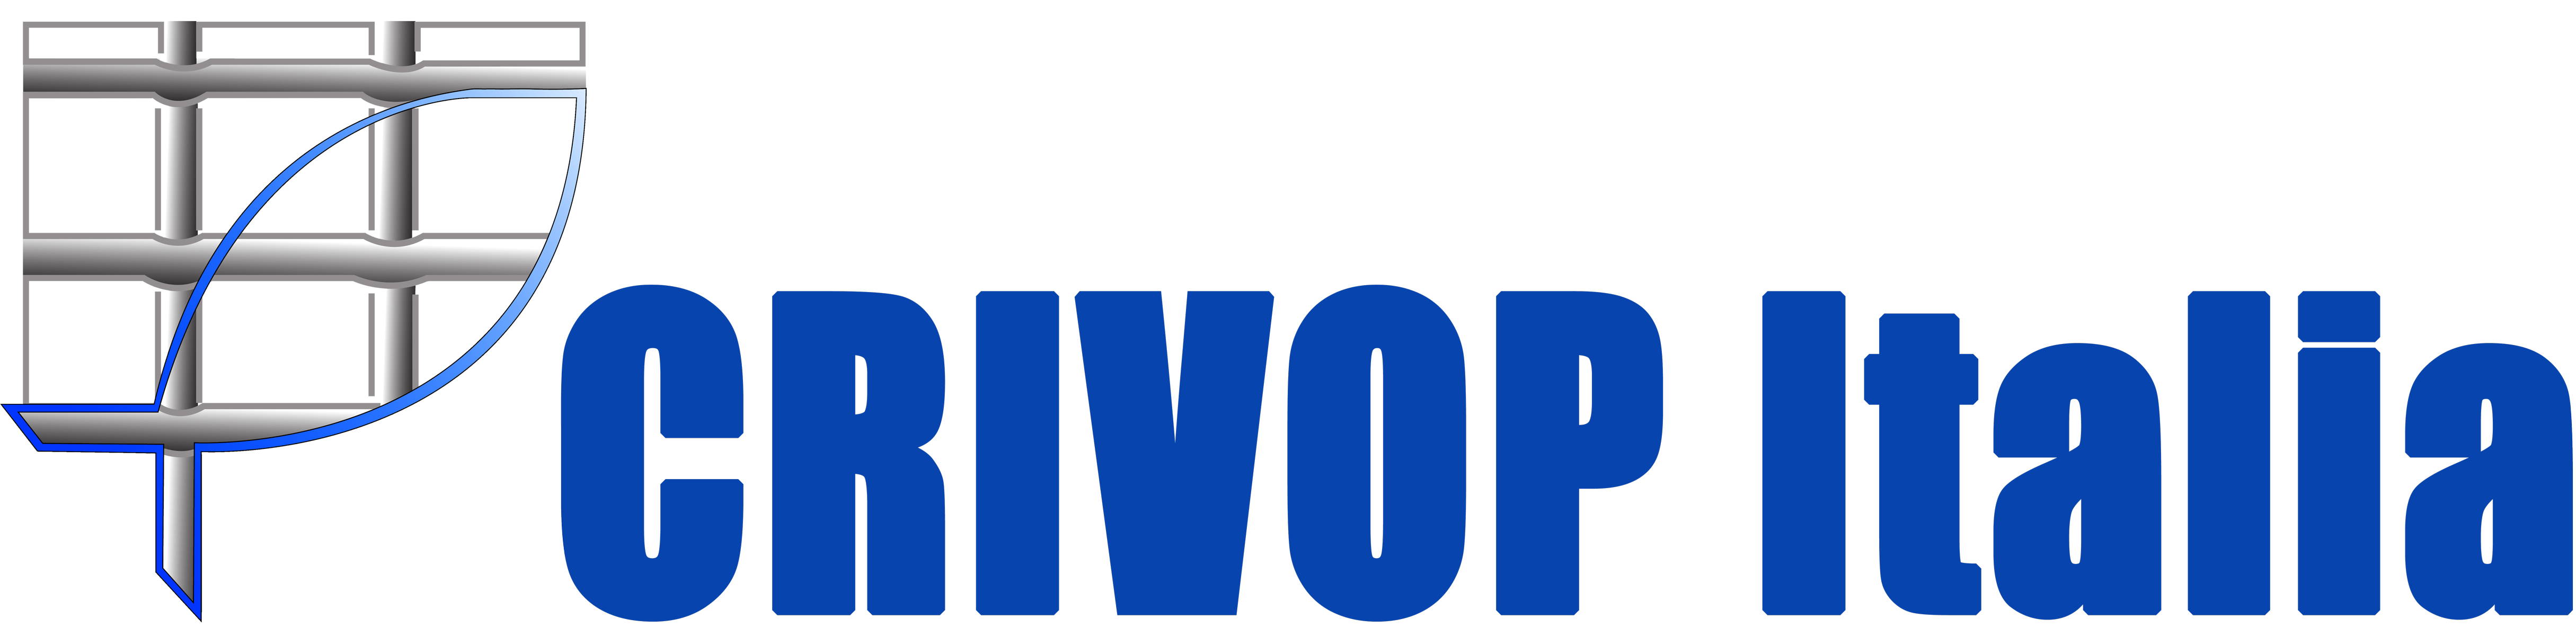 Logo Crivop Italia